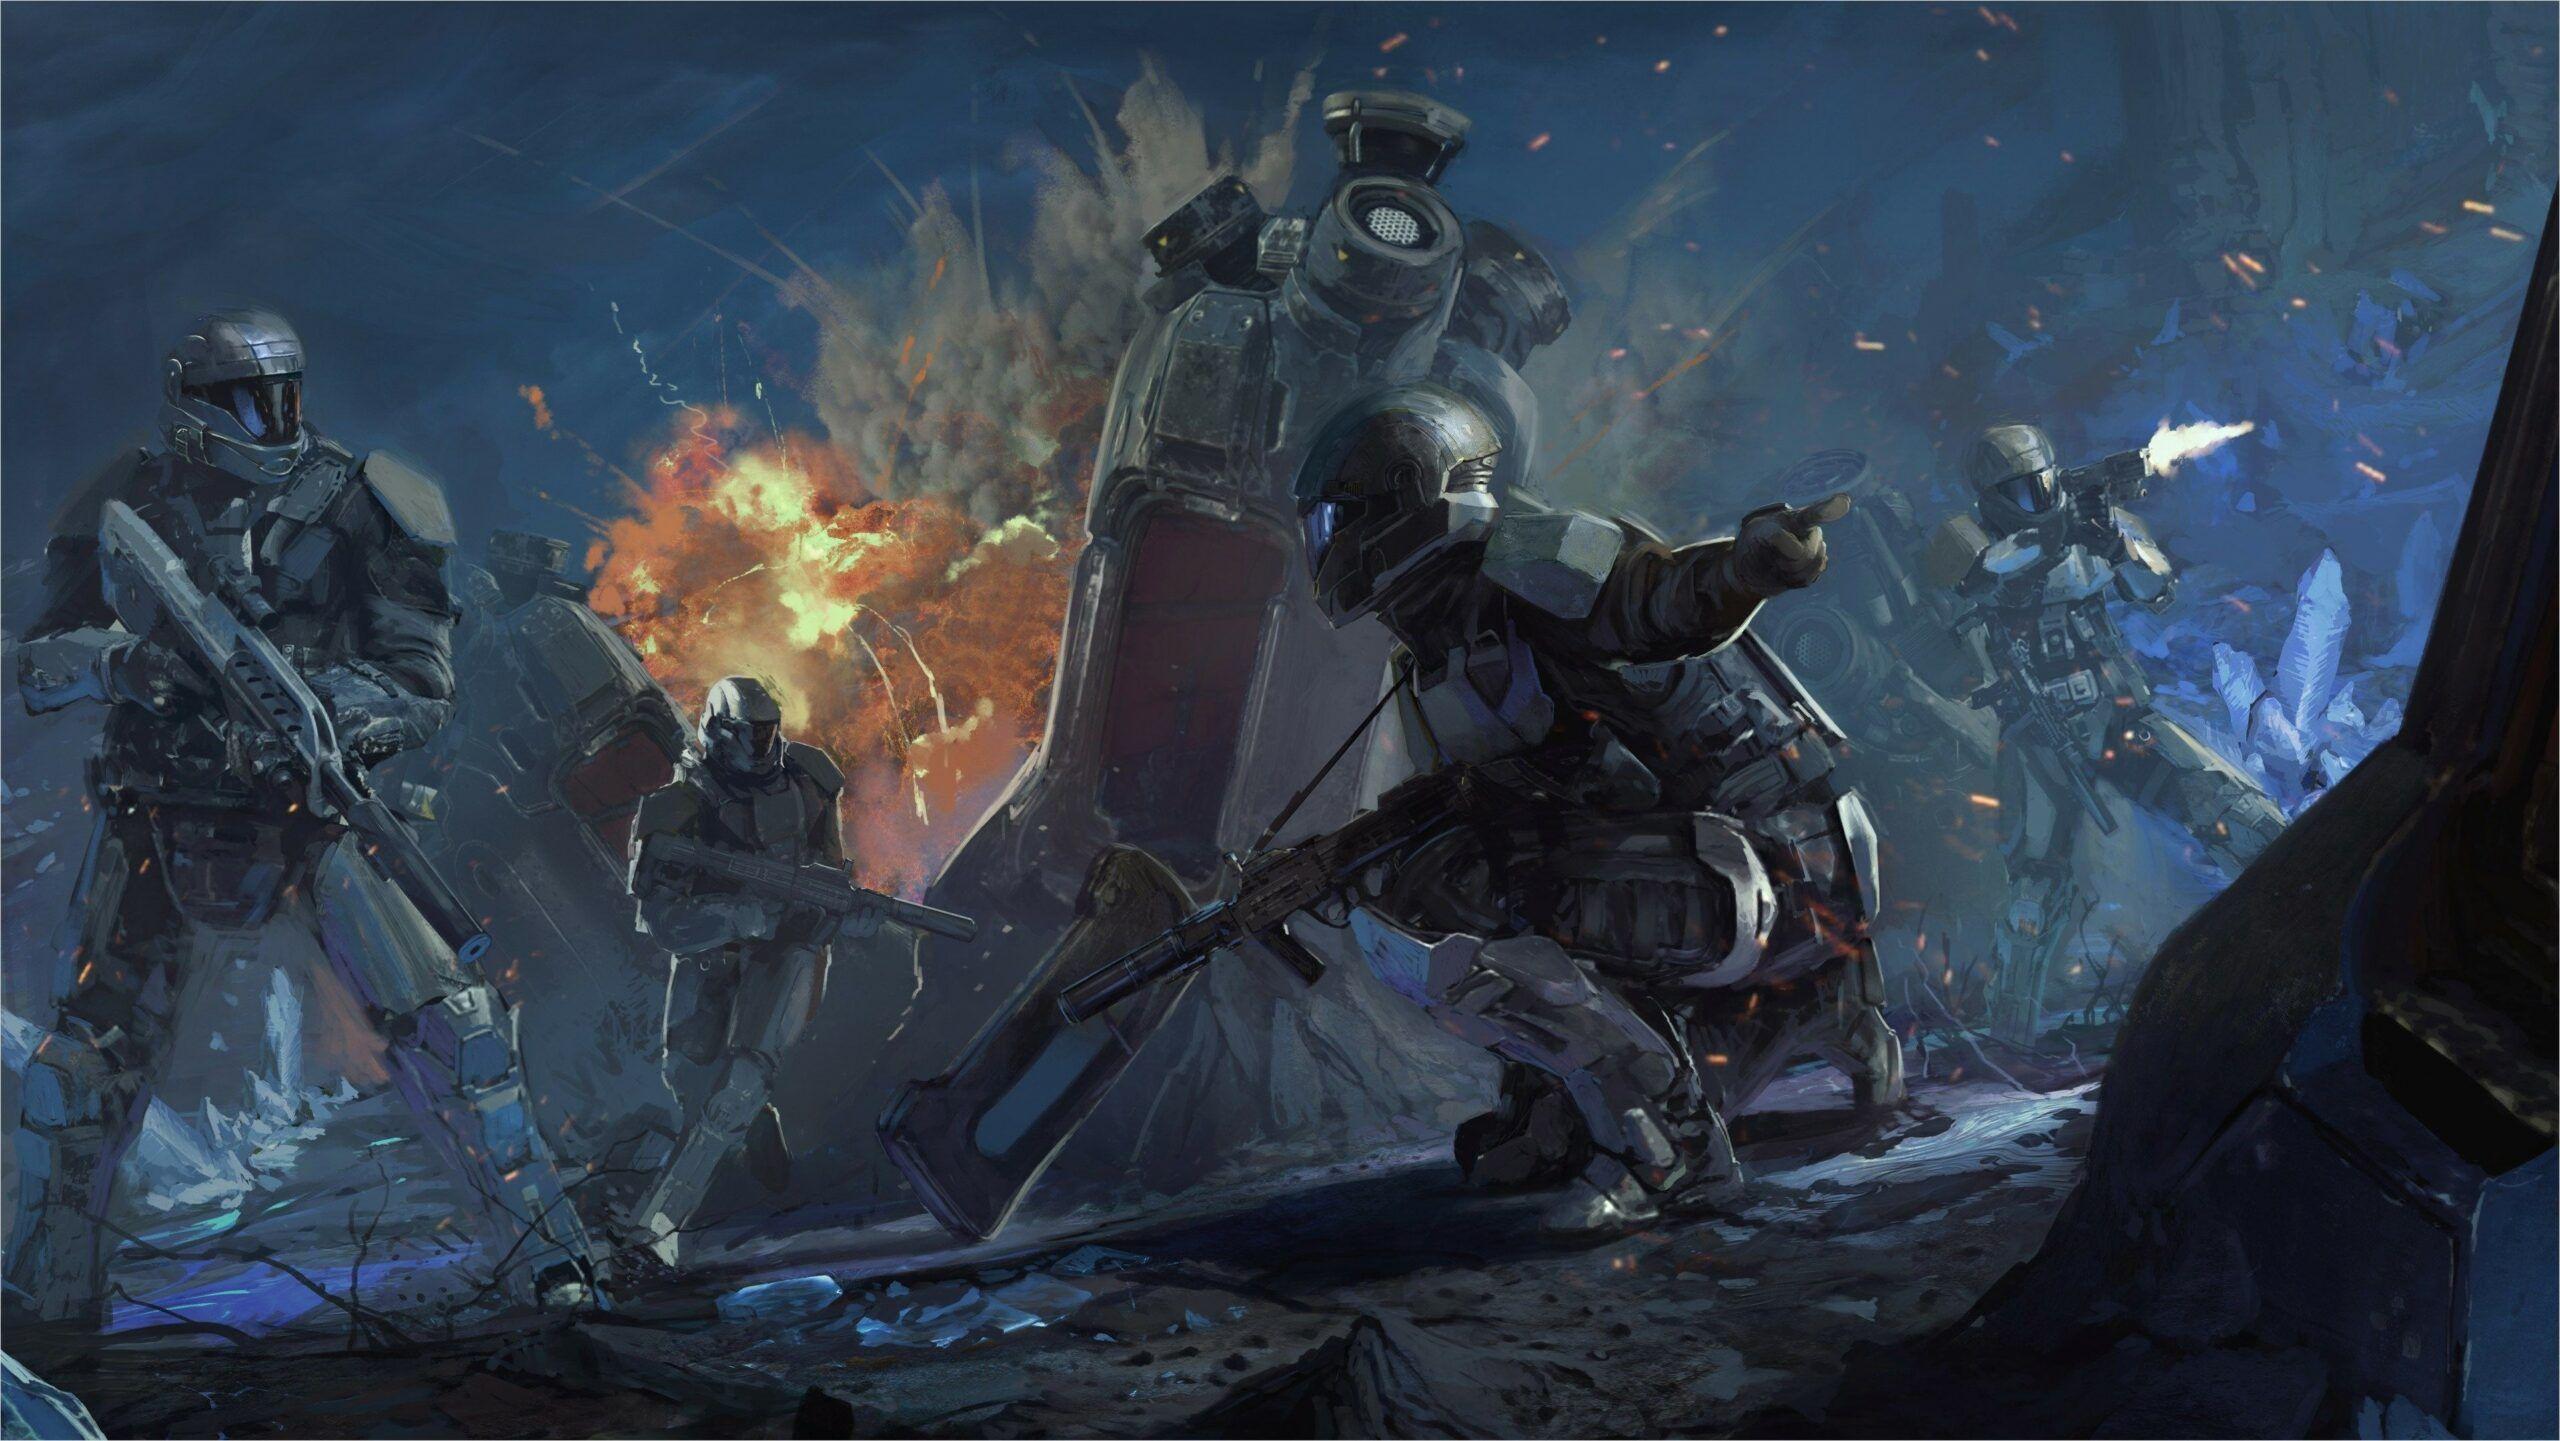 3 2 4k Wallpaper In 2020 Halo Armor Halo Halo 3 Odst